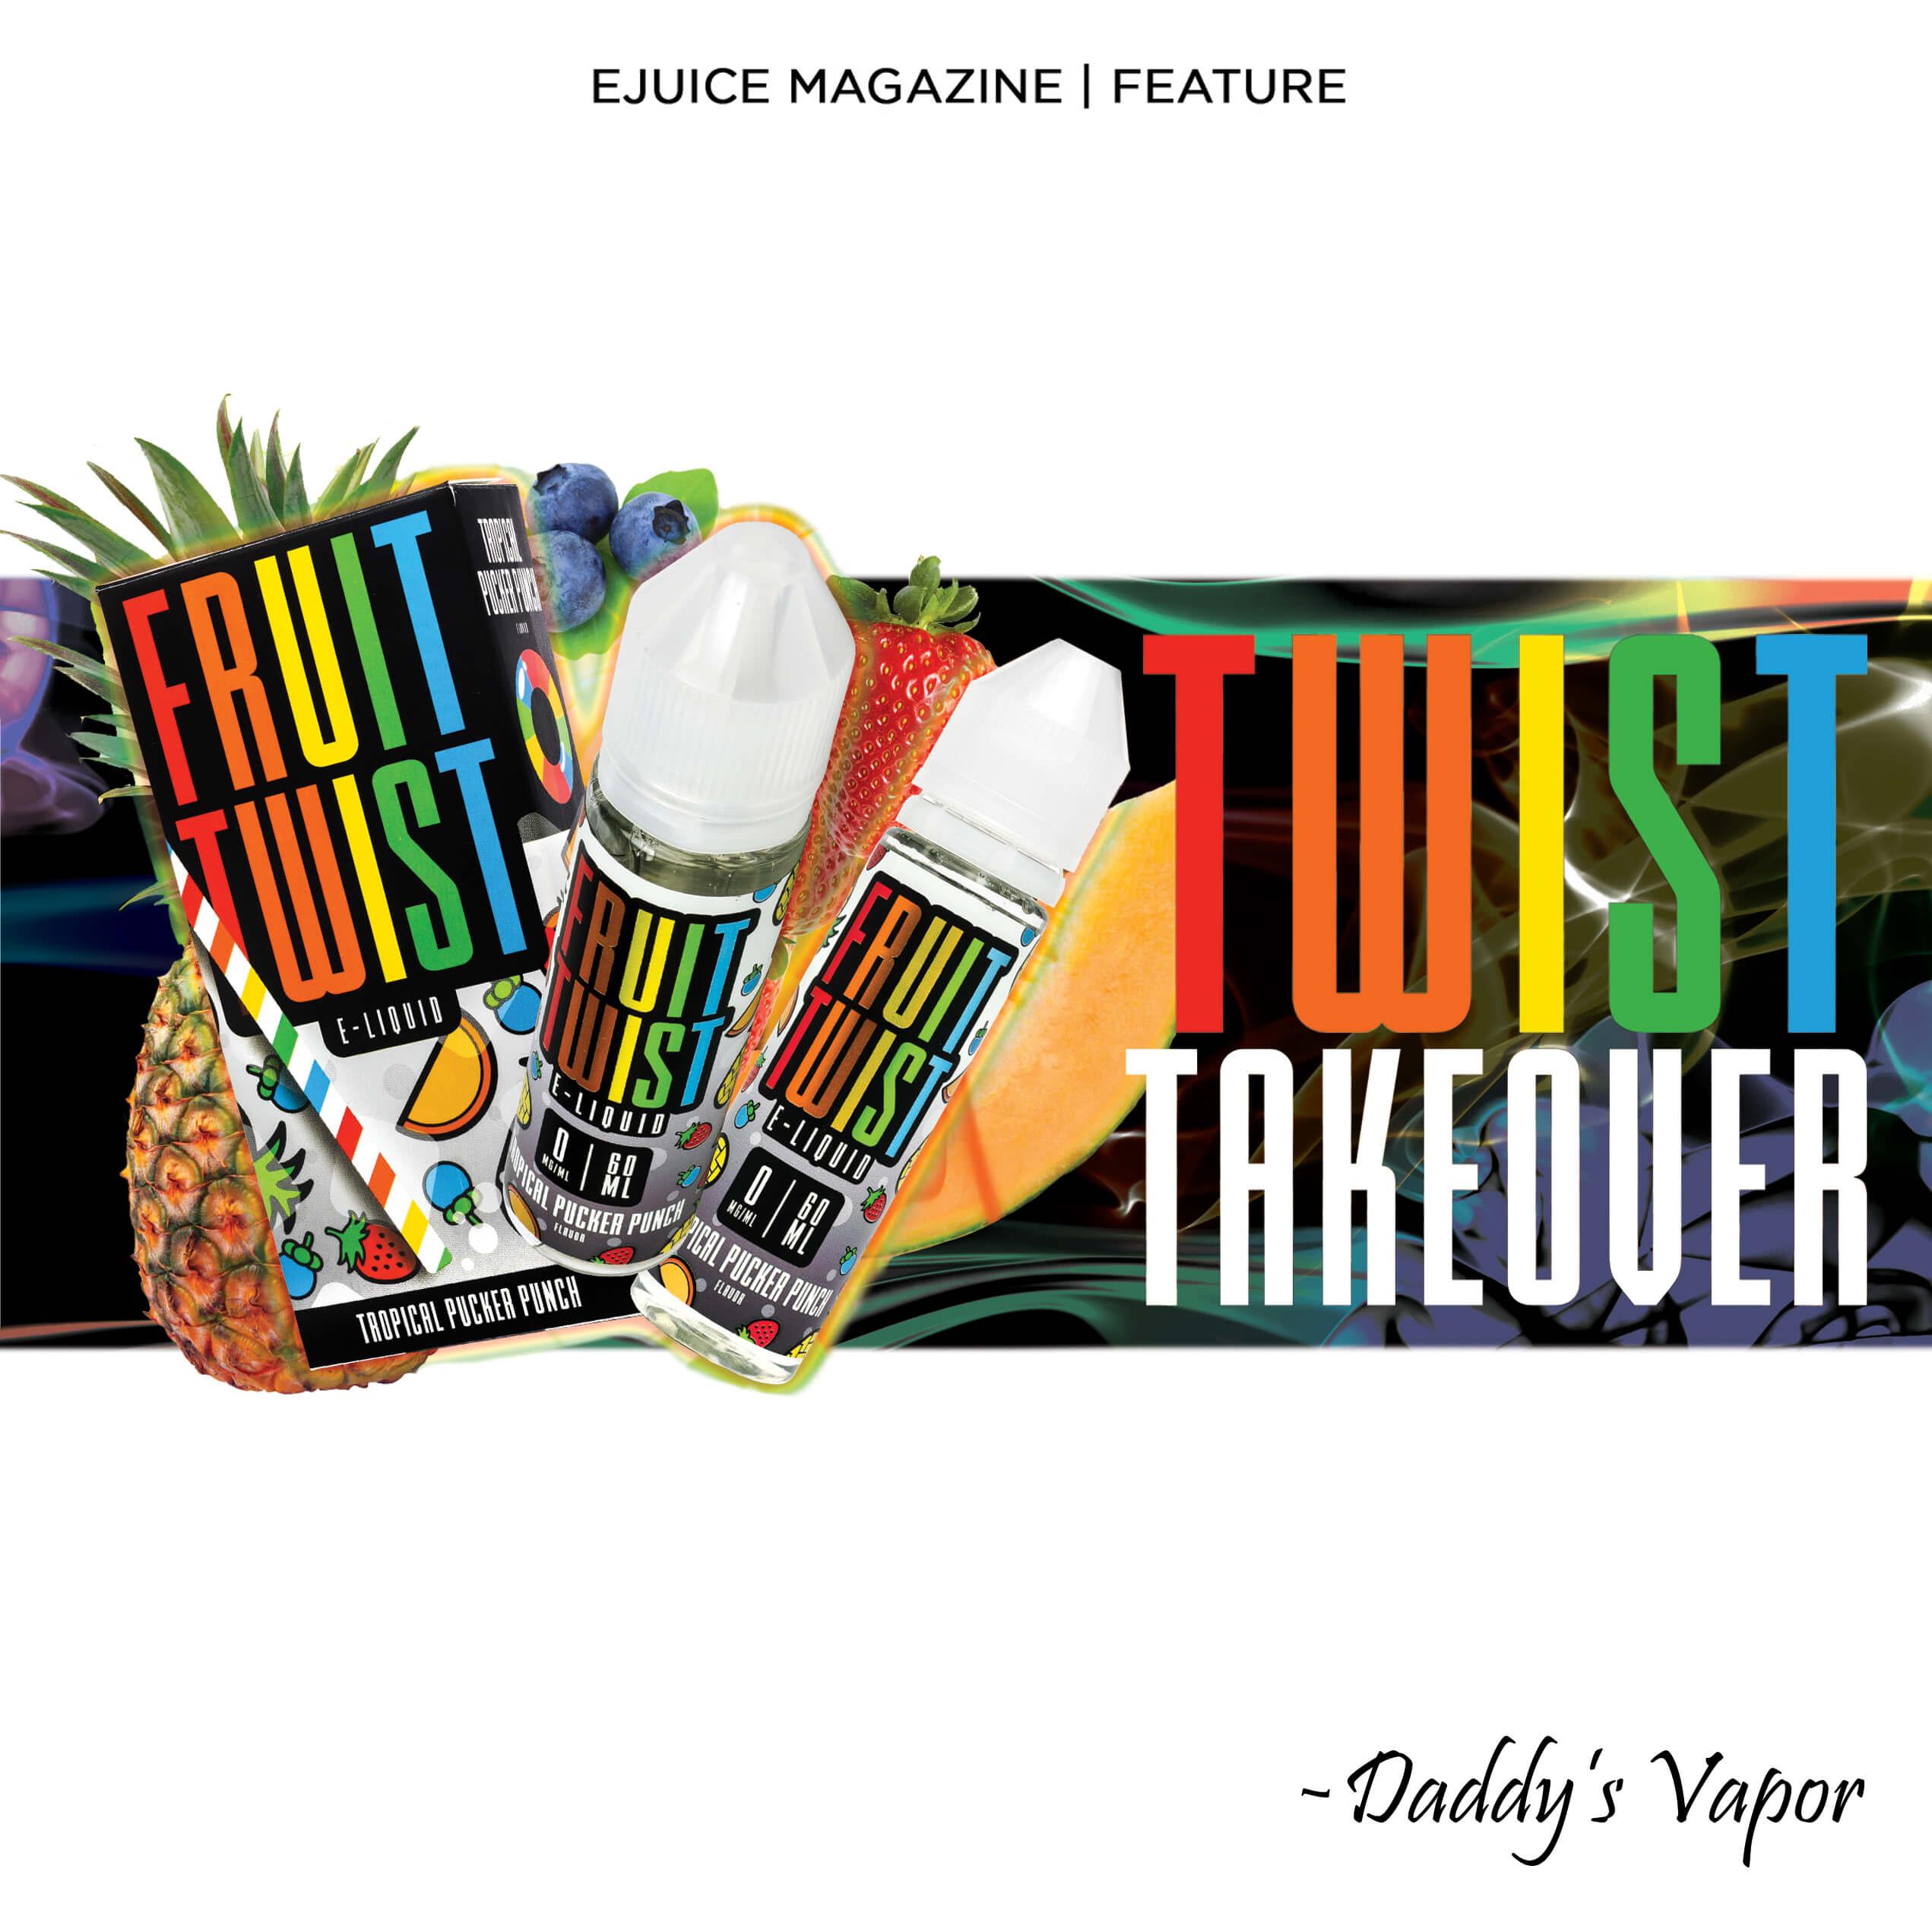 daddys vapor twist eliquid twist takeover featured image eliquid